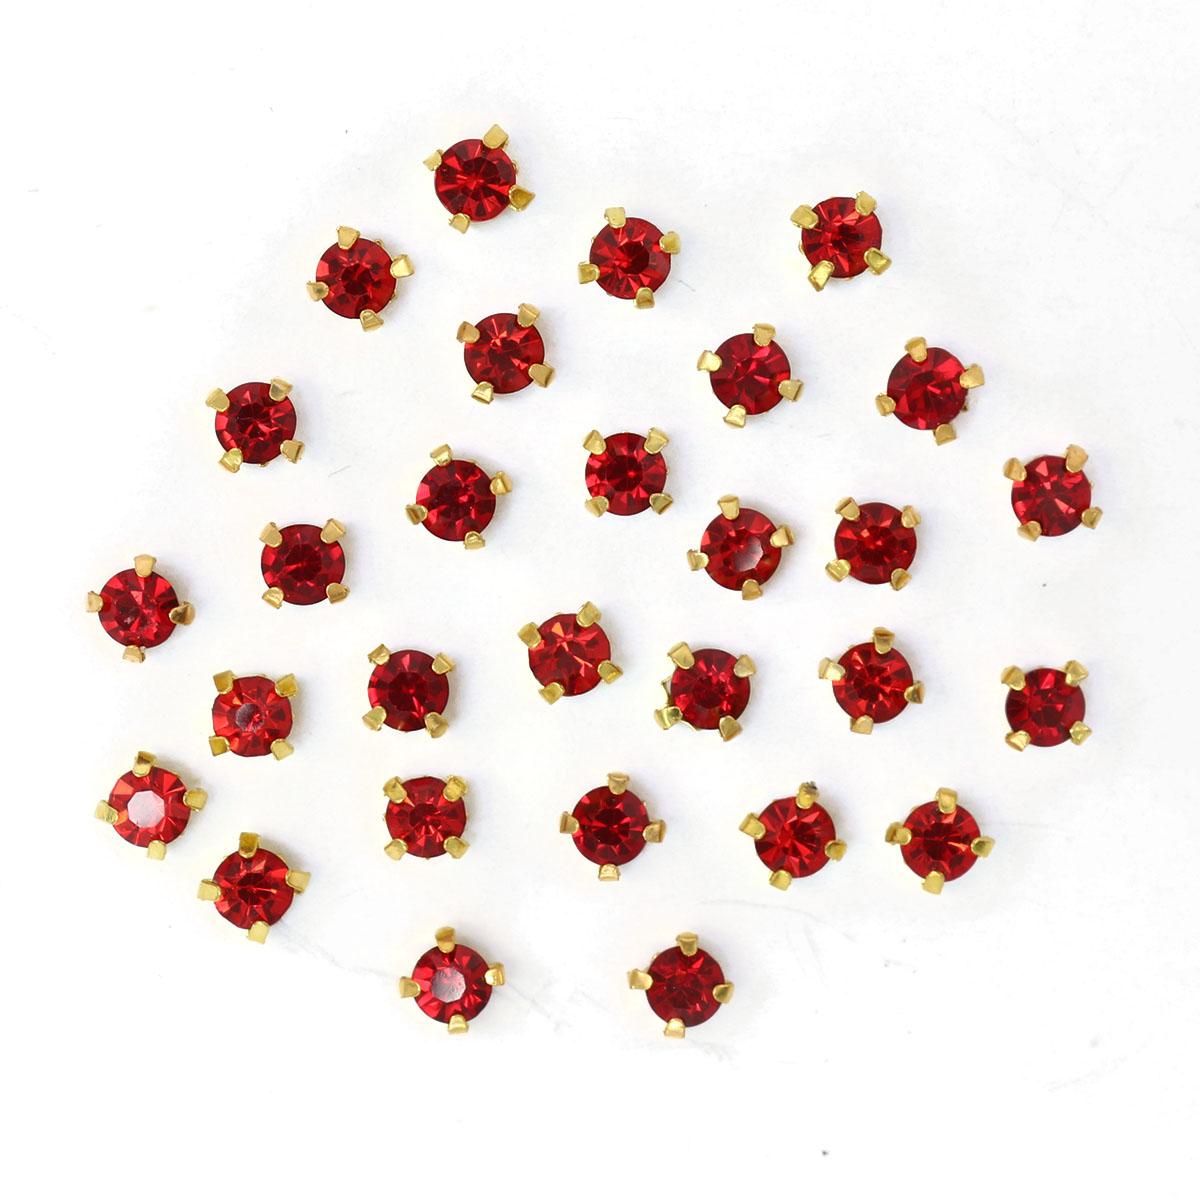 ЗЦ012НН44 Хрустальные стразы в цапах круглые (золото) красный 4*4мм, 29-30шт/упак Астра